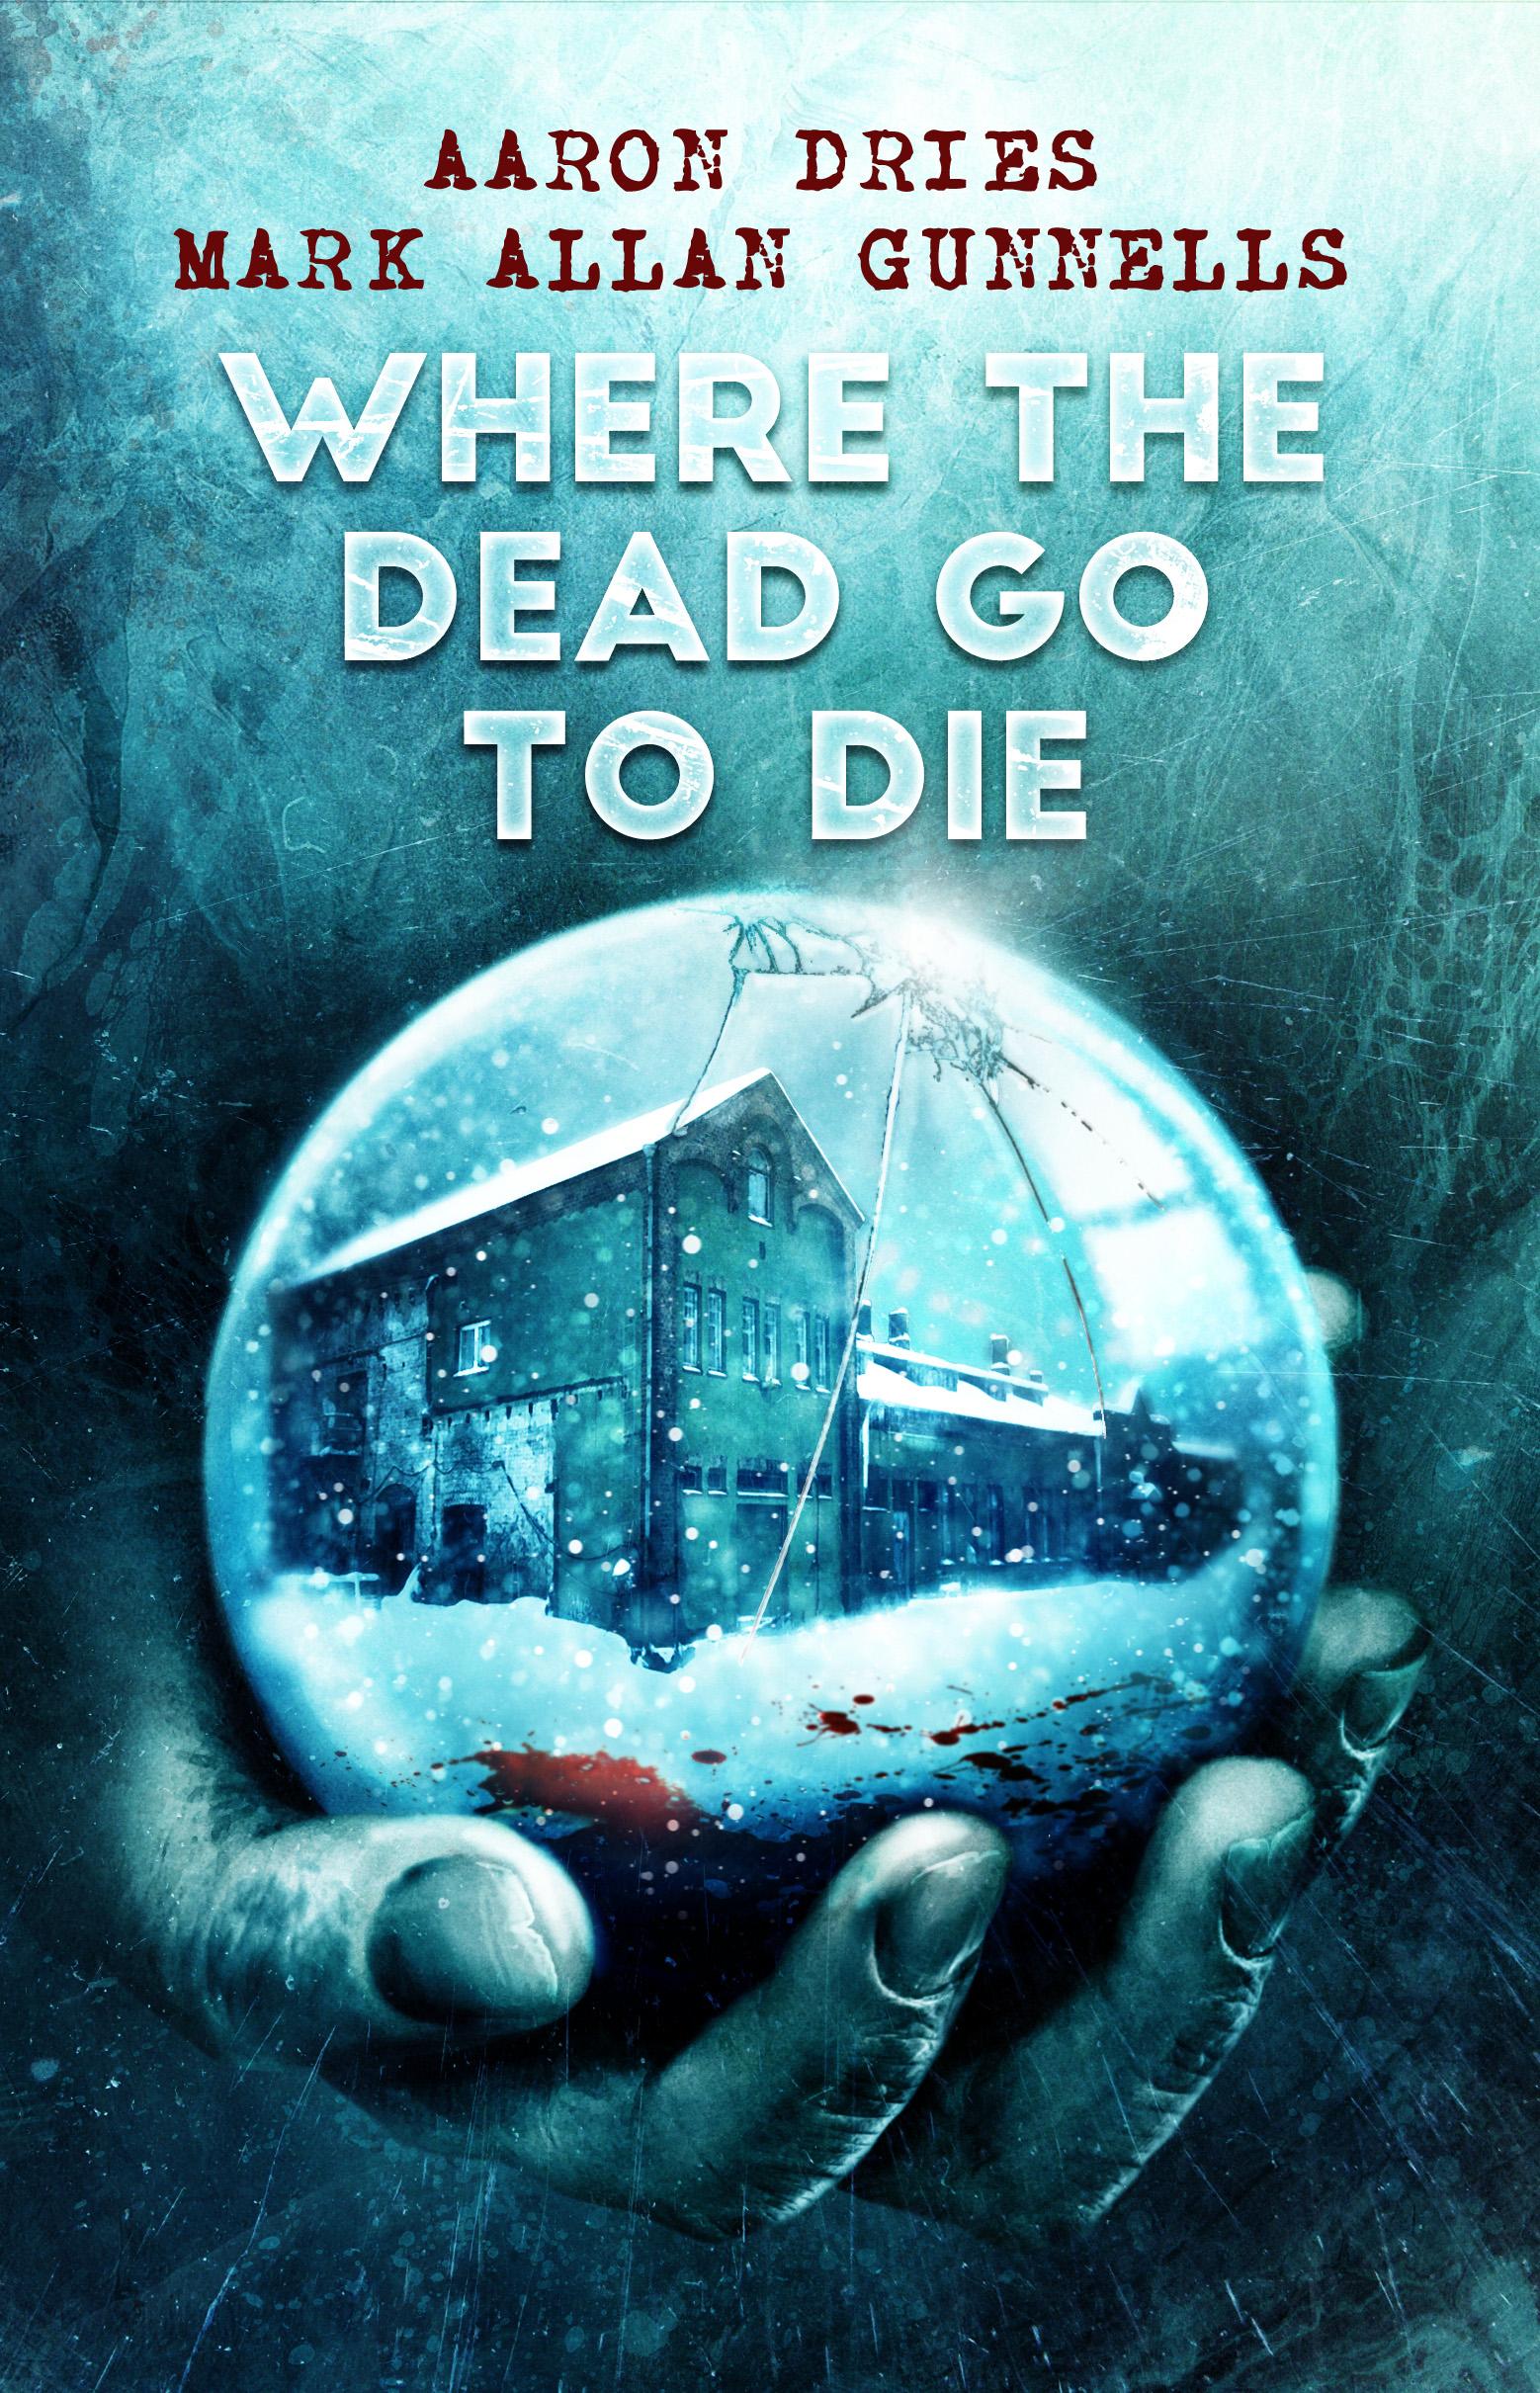 wherethe-dead-go-to-die